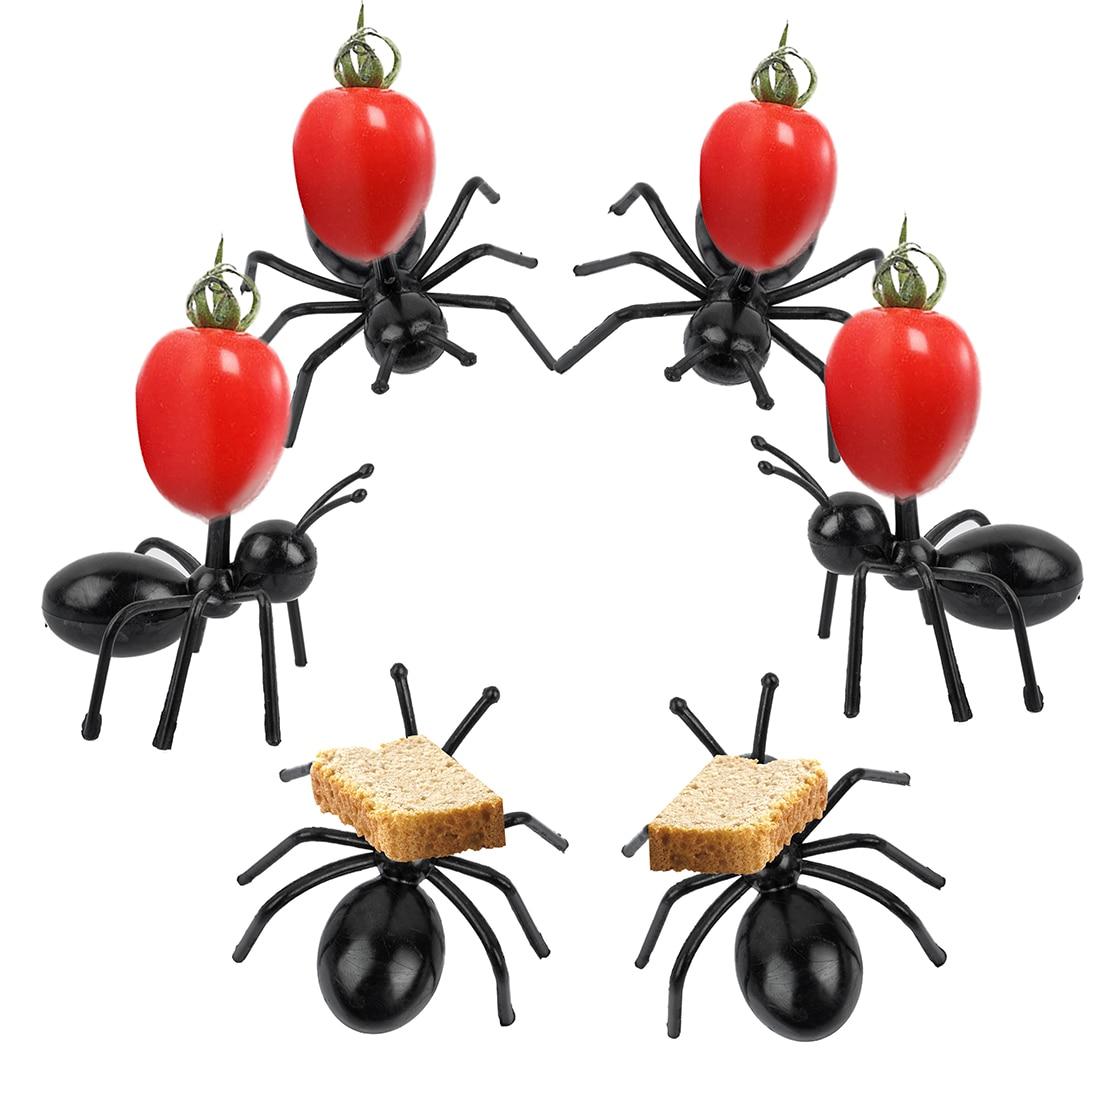 Aliexpress.com : Buy 12pcs/set Cute Mini Ant Fruit Fork ...